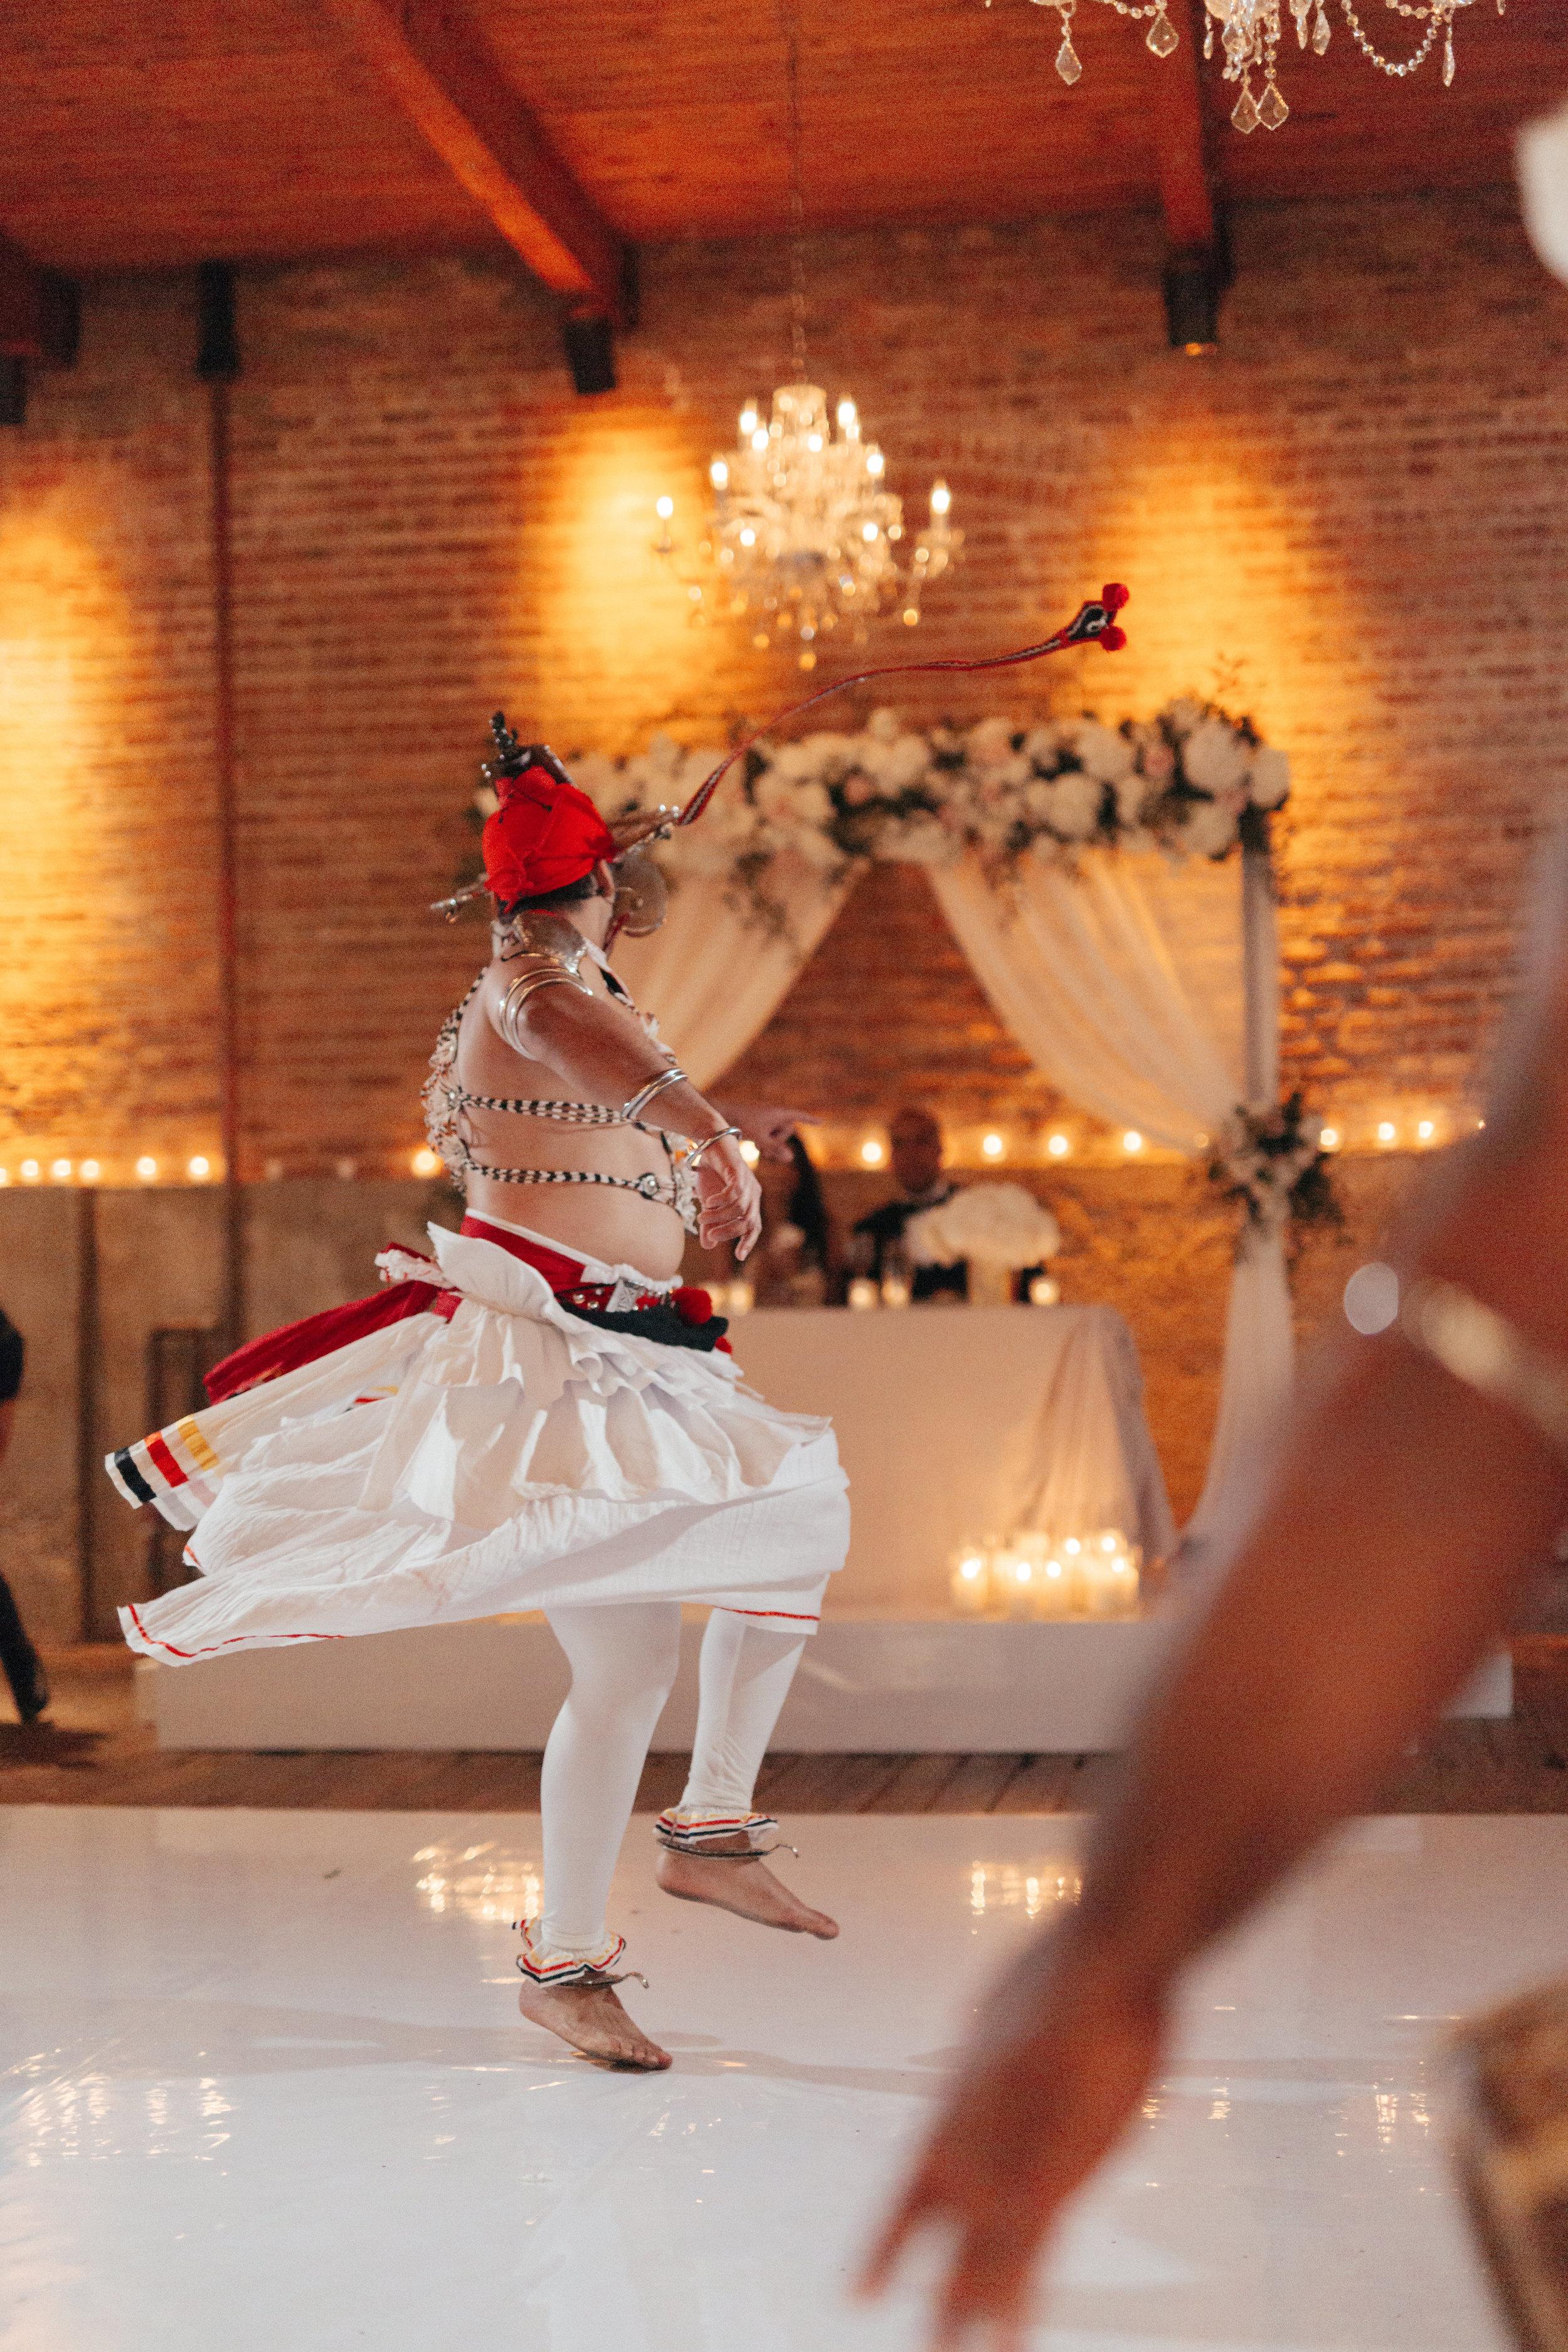 Mindy&Jared-wedding-by-LadiesAndGentlemen-by-Matija-Vuri-4949.jpg